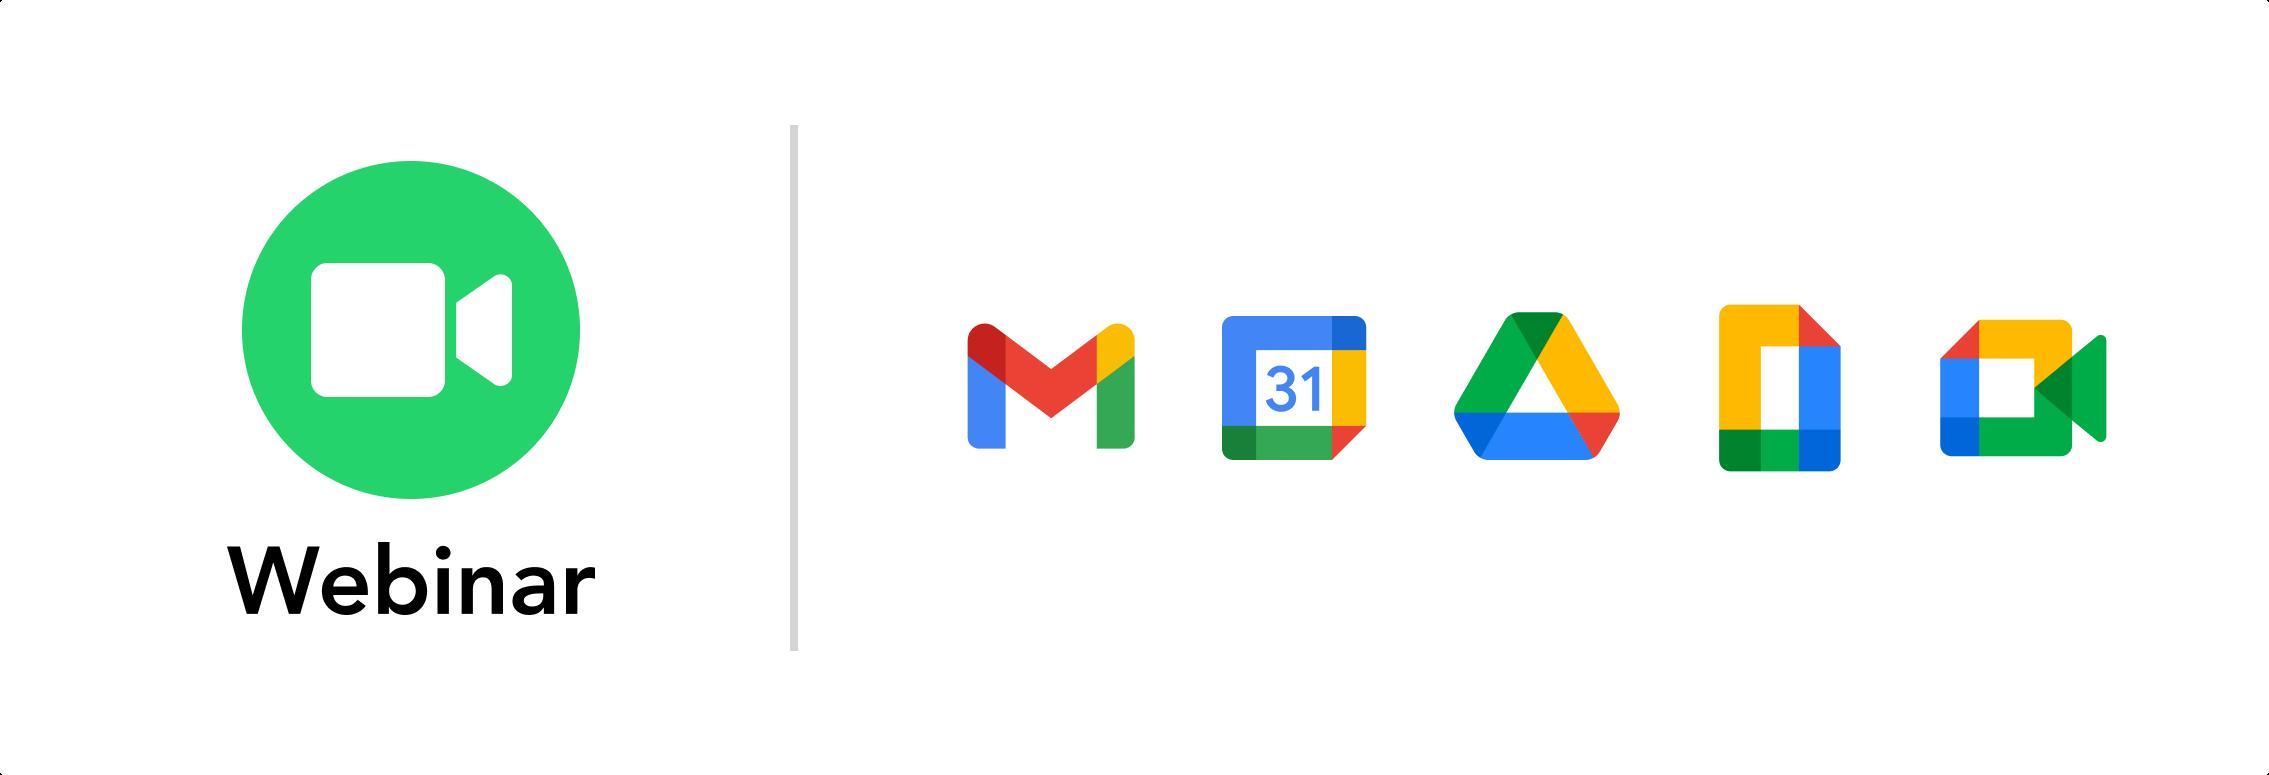 Google Workspace for Education Webinar